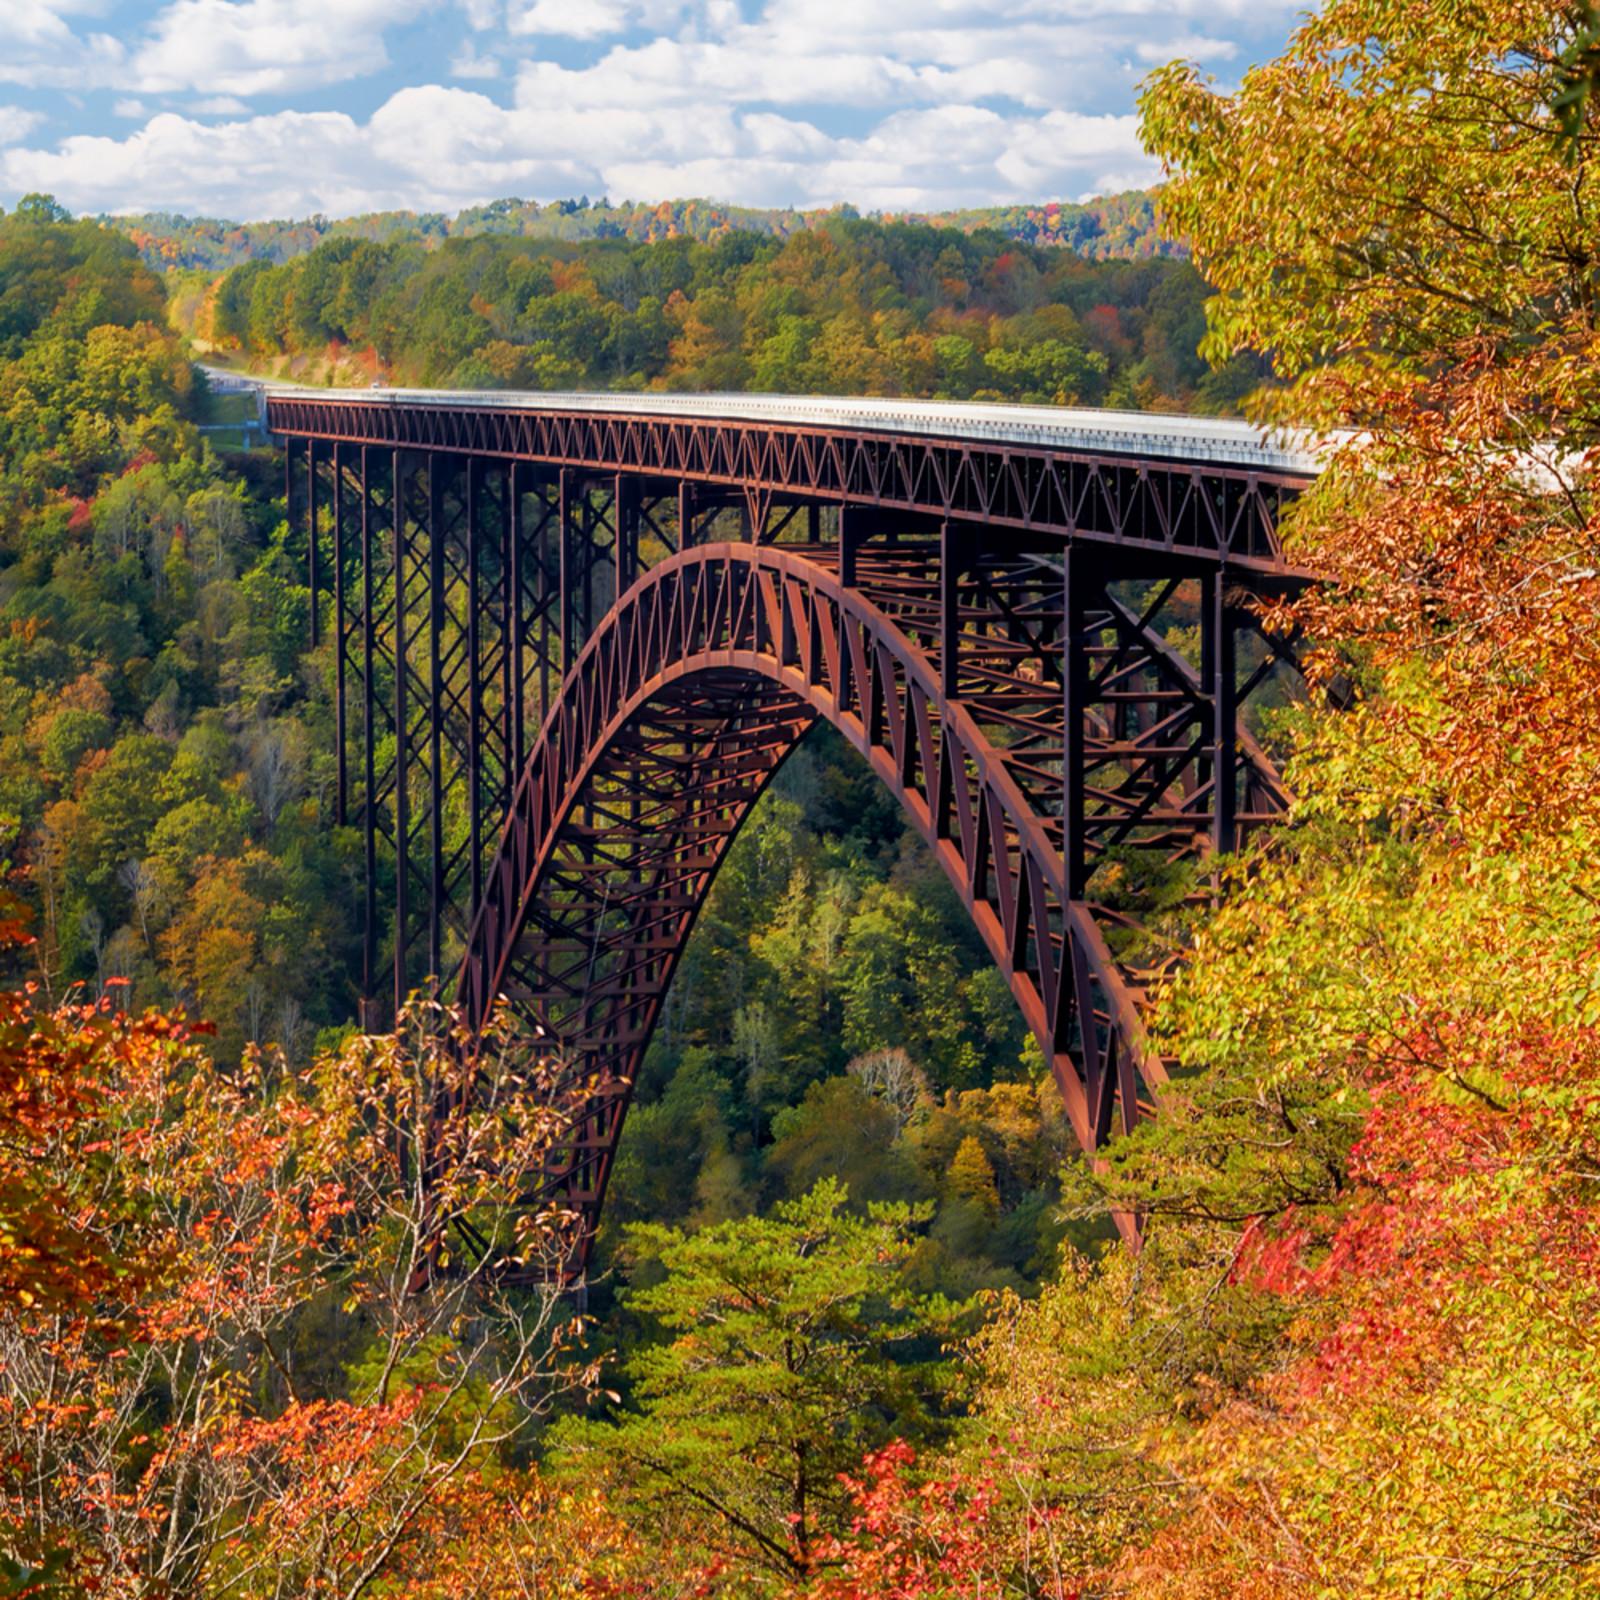 New river gorge bridge oscar 4x5 n01nku